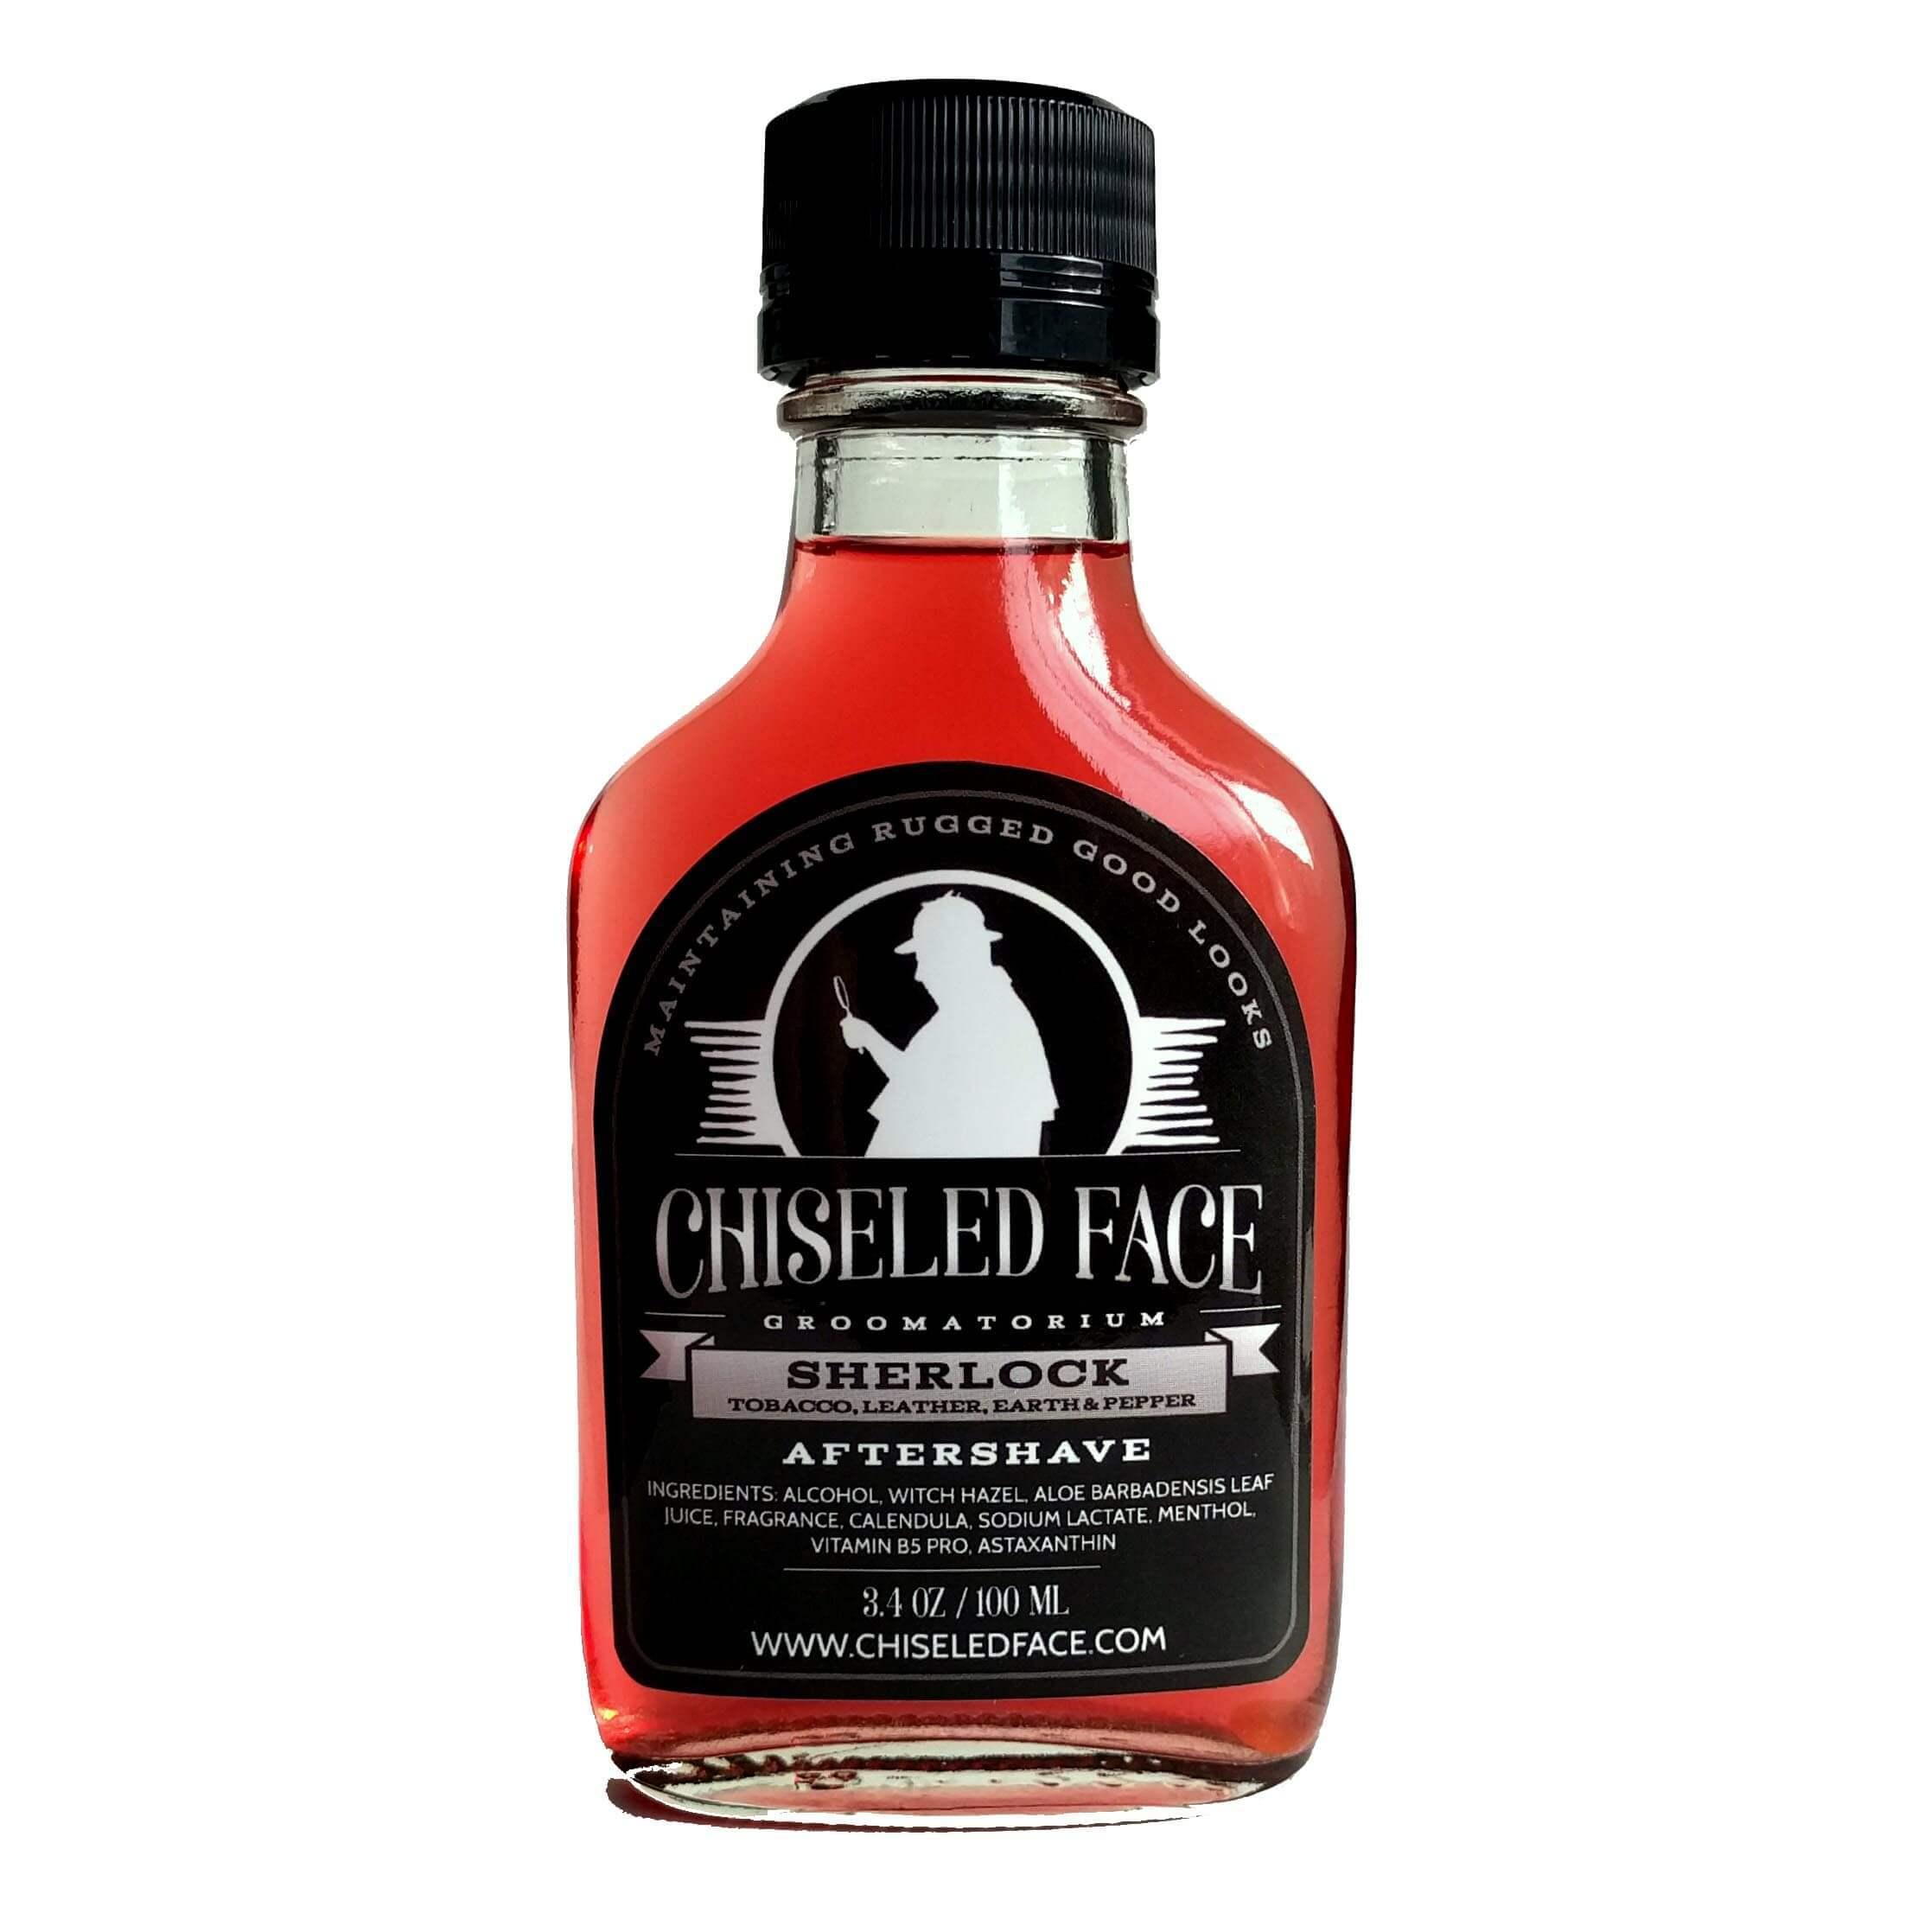 Chiseled Face - Sherlock - Aftershave image